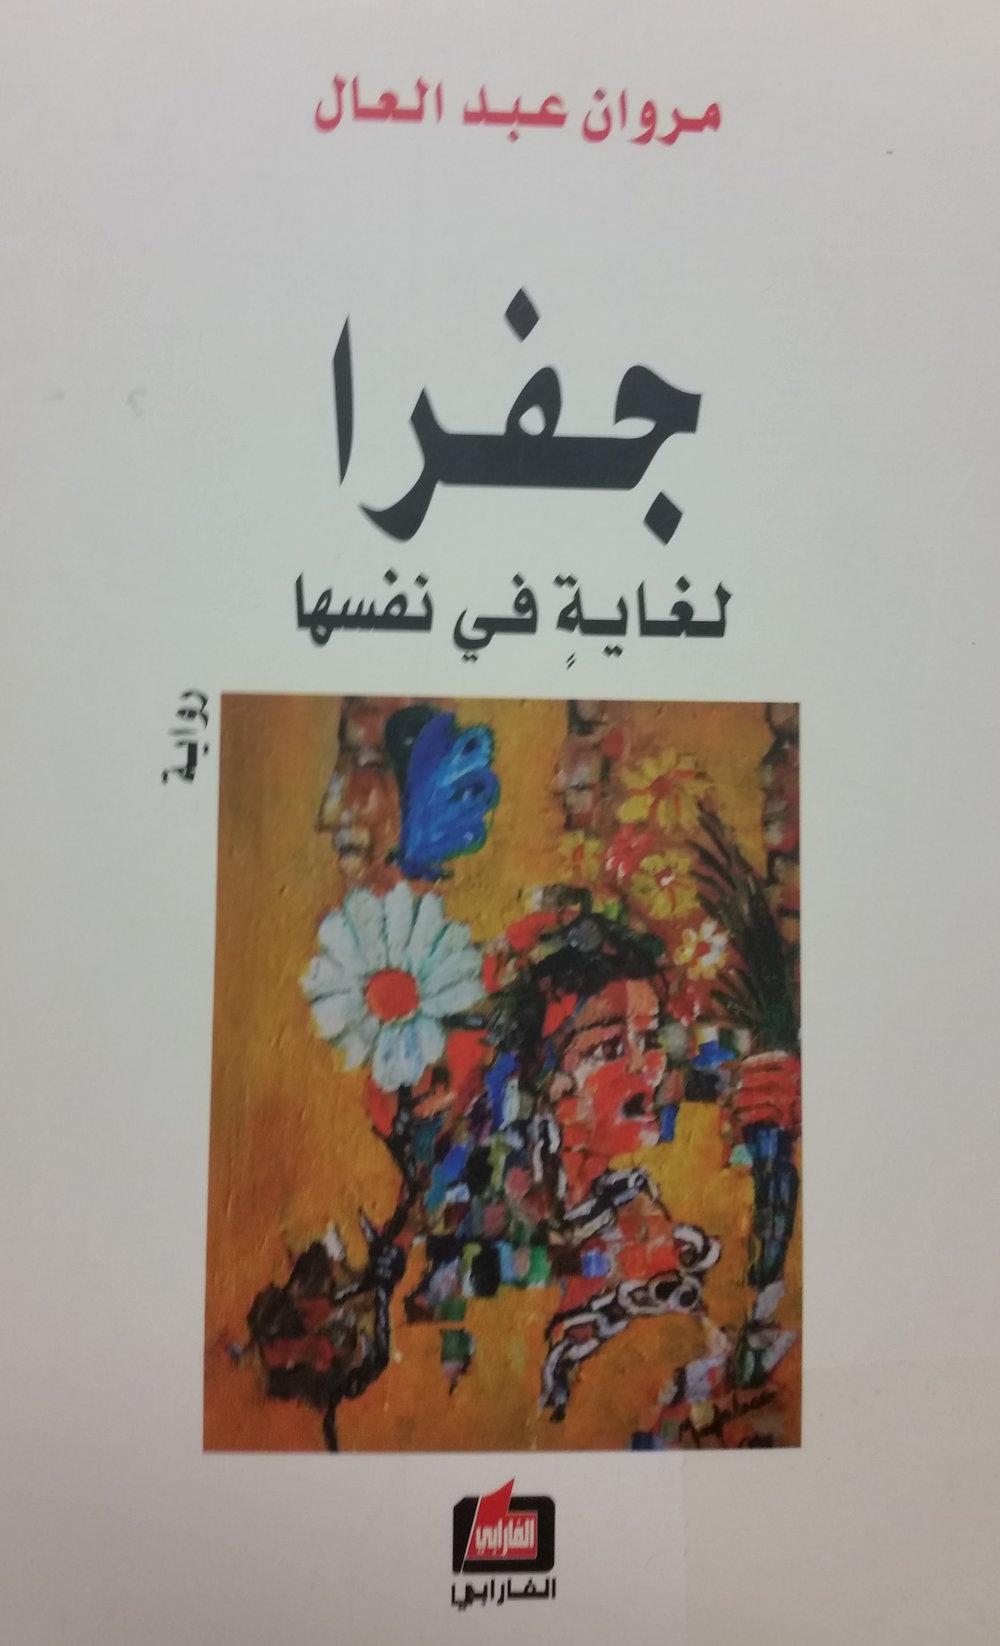 Marwān ʿAbd al-ʿĀl (Bayrūt : Dār al-Fārābī, 2010)